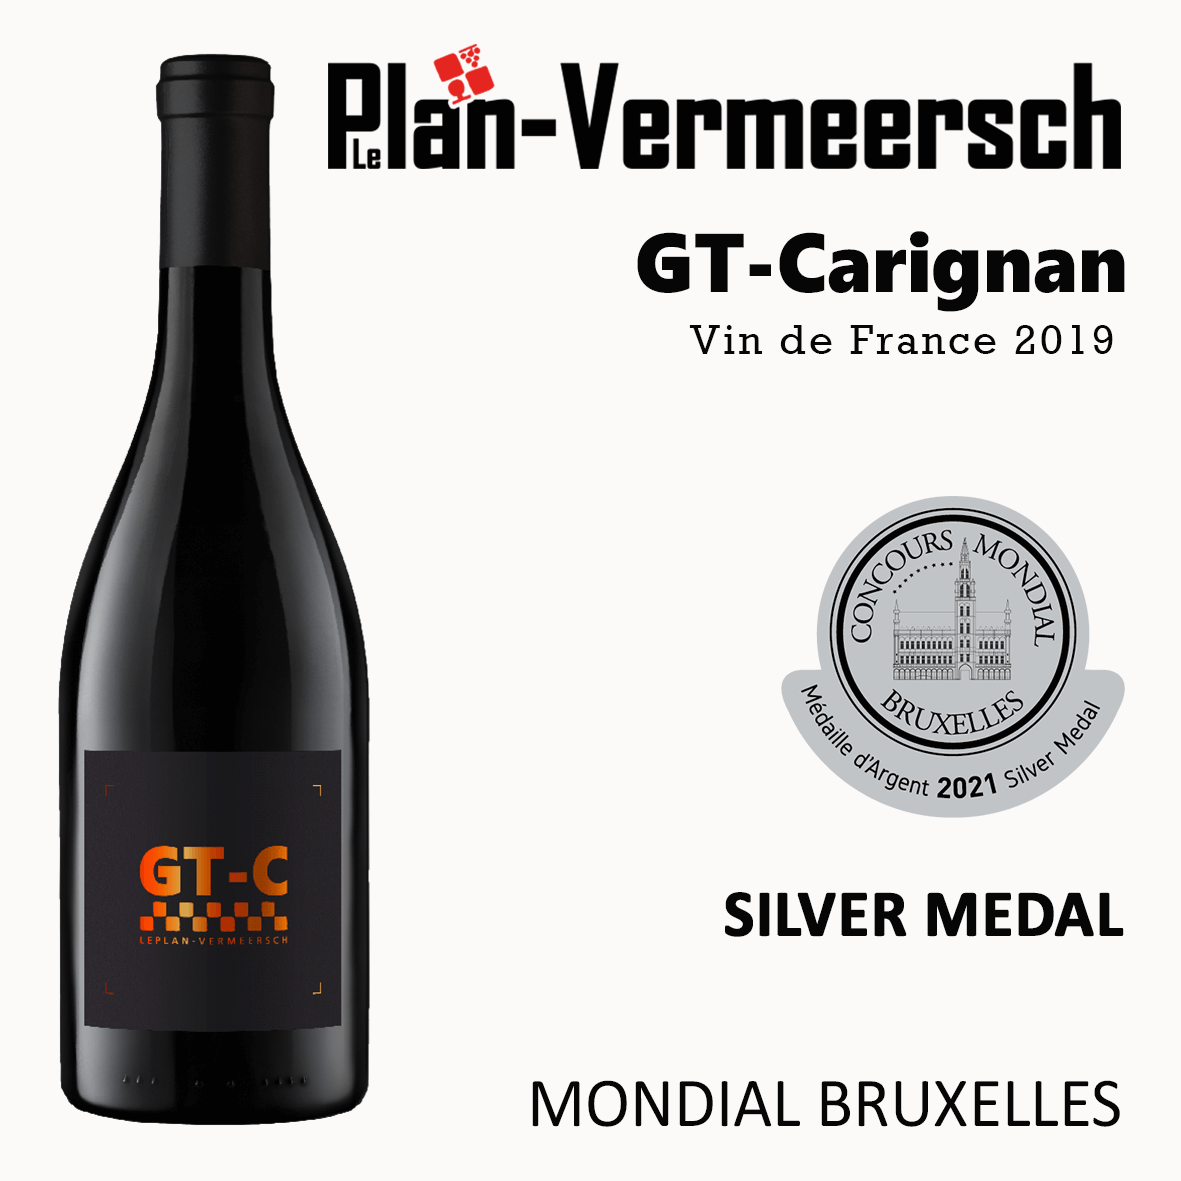 Vin de France Bottle wine GT Carignan silver medal mondial Bruxelles LePlan-Vermmersch